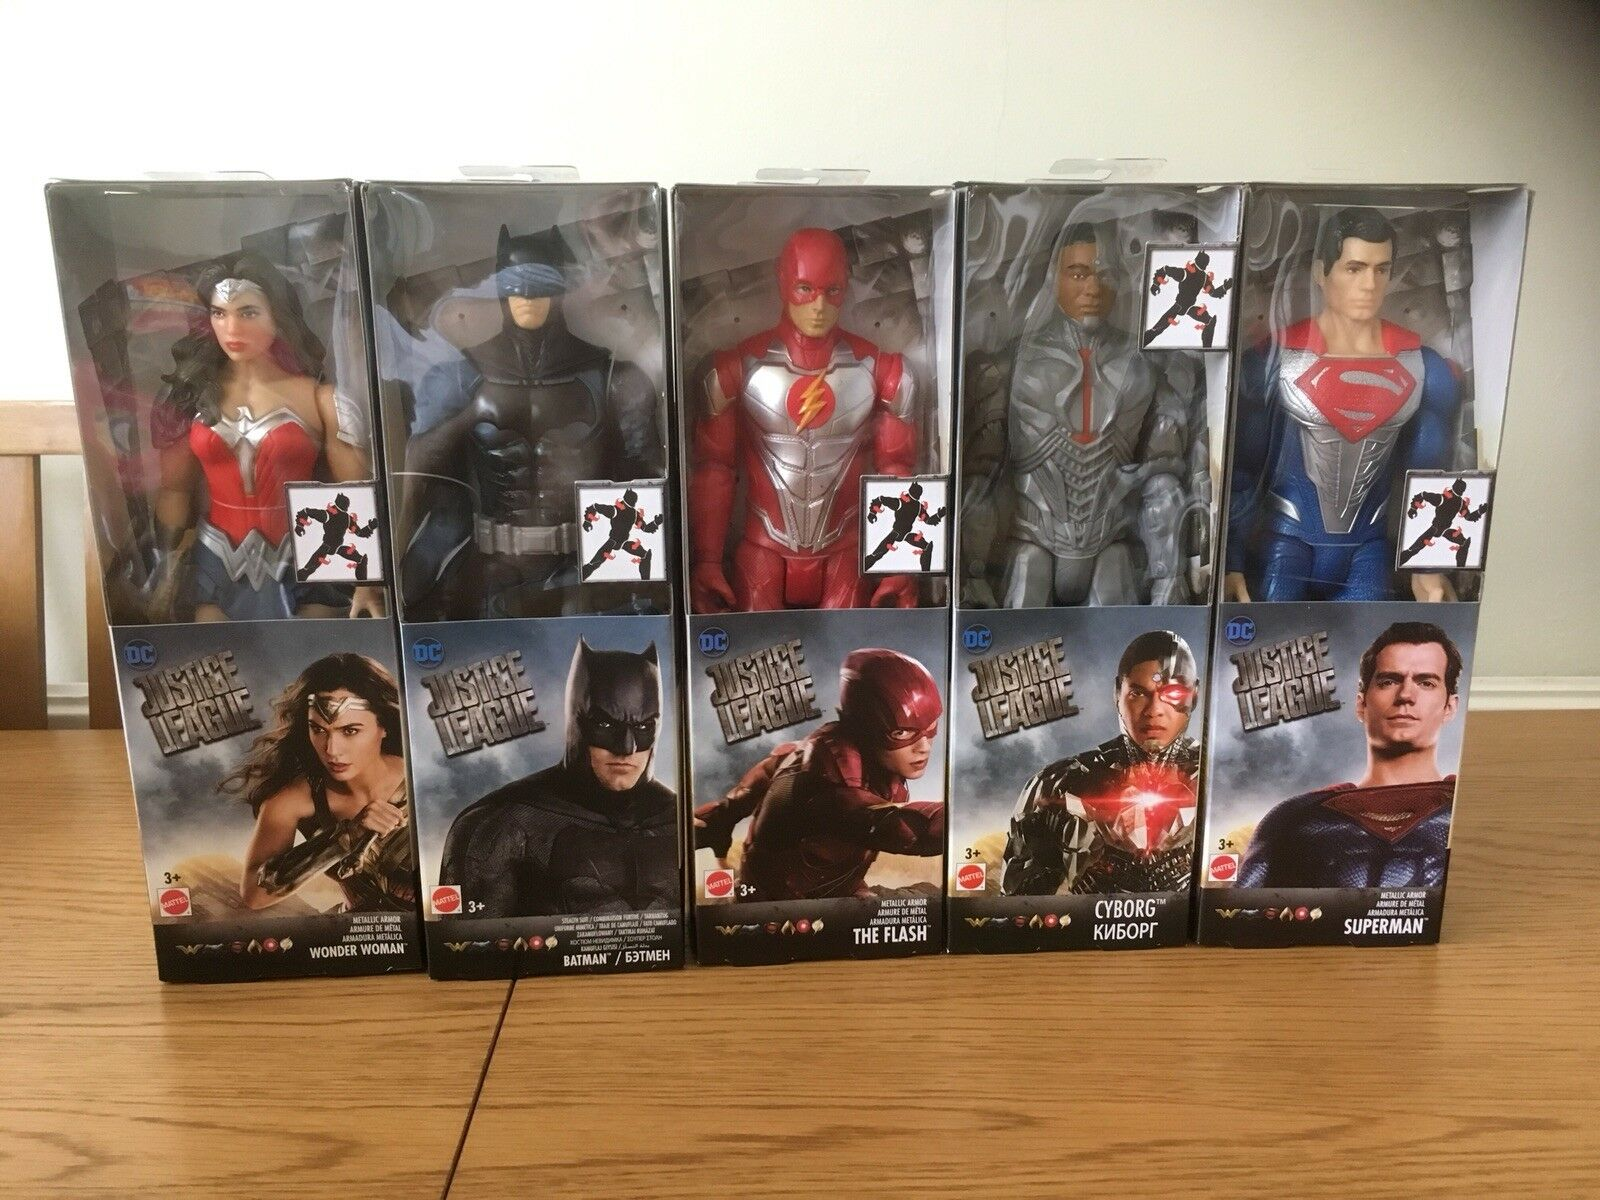 DC COMICS / MATTEL JUSTICE LEAGUE 12 INCH FIGURES X 5 BATMAN, SUPERMAN & MORE